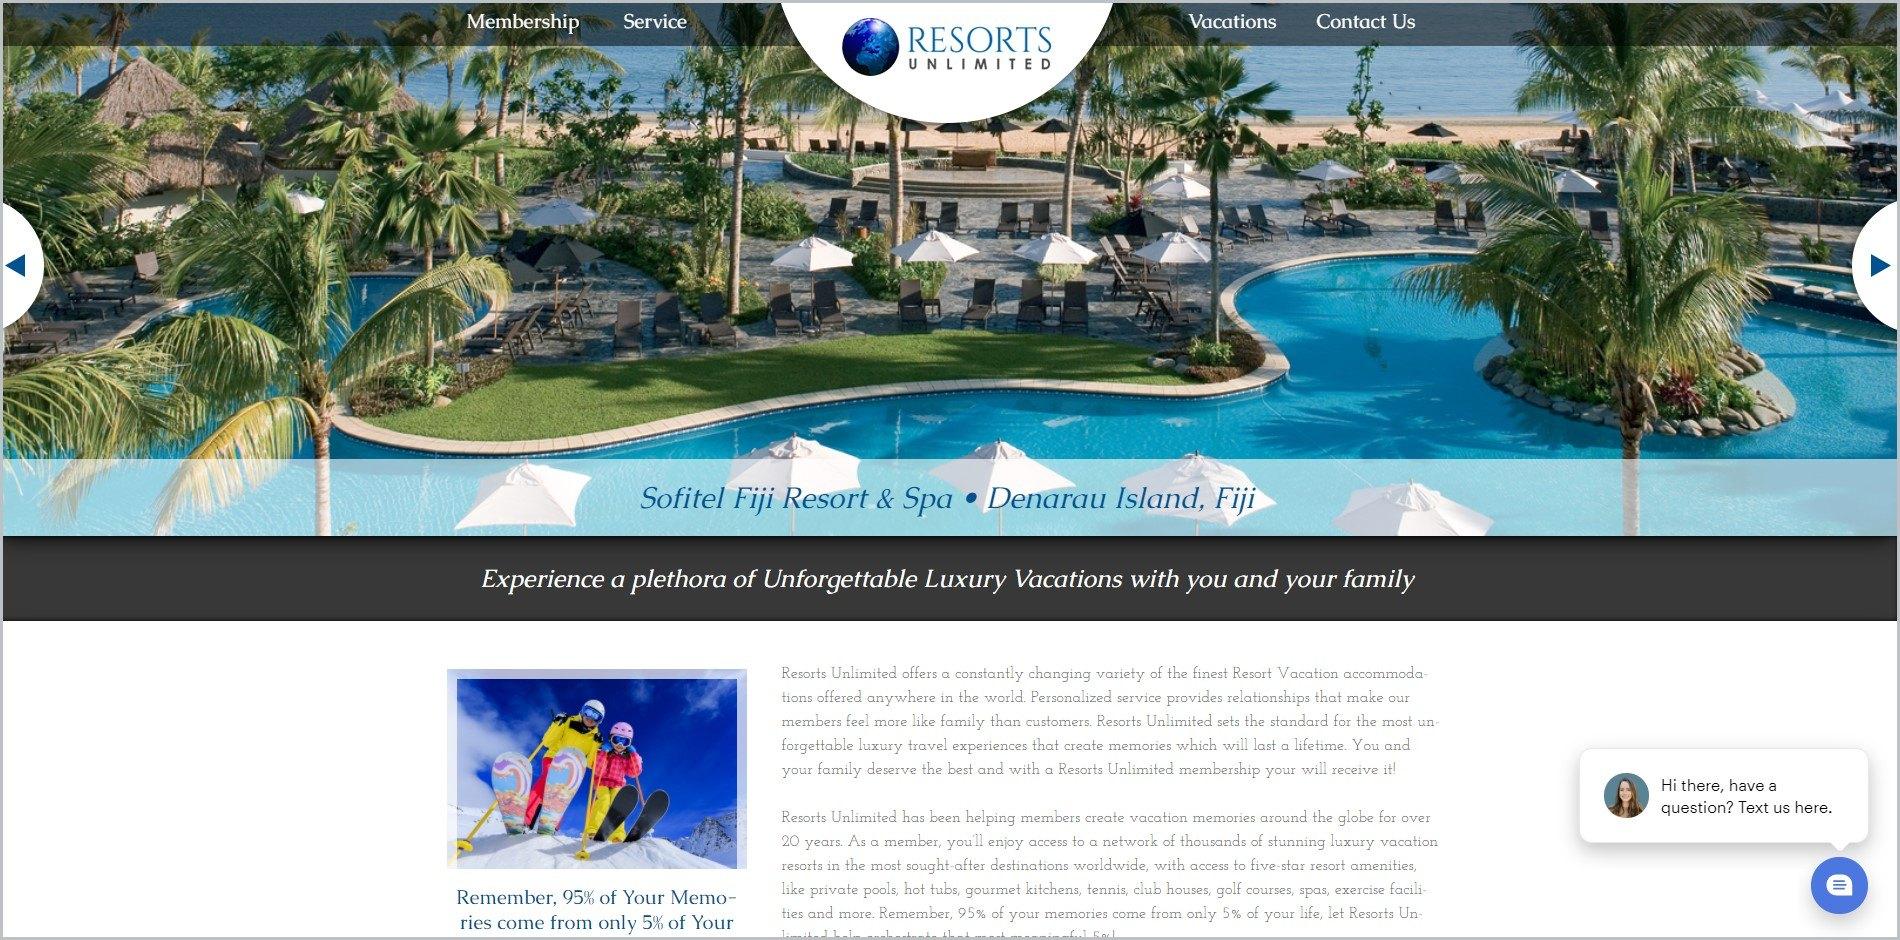 screenshot of Resorts Unlimited homepage, with black header bearing the website's name and main navigation menu